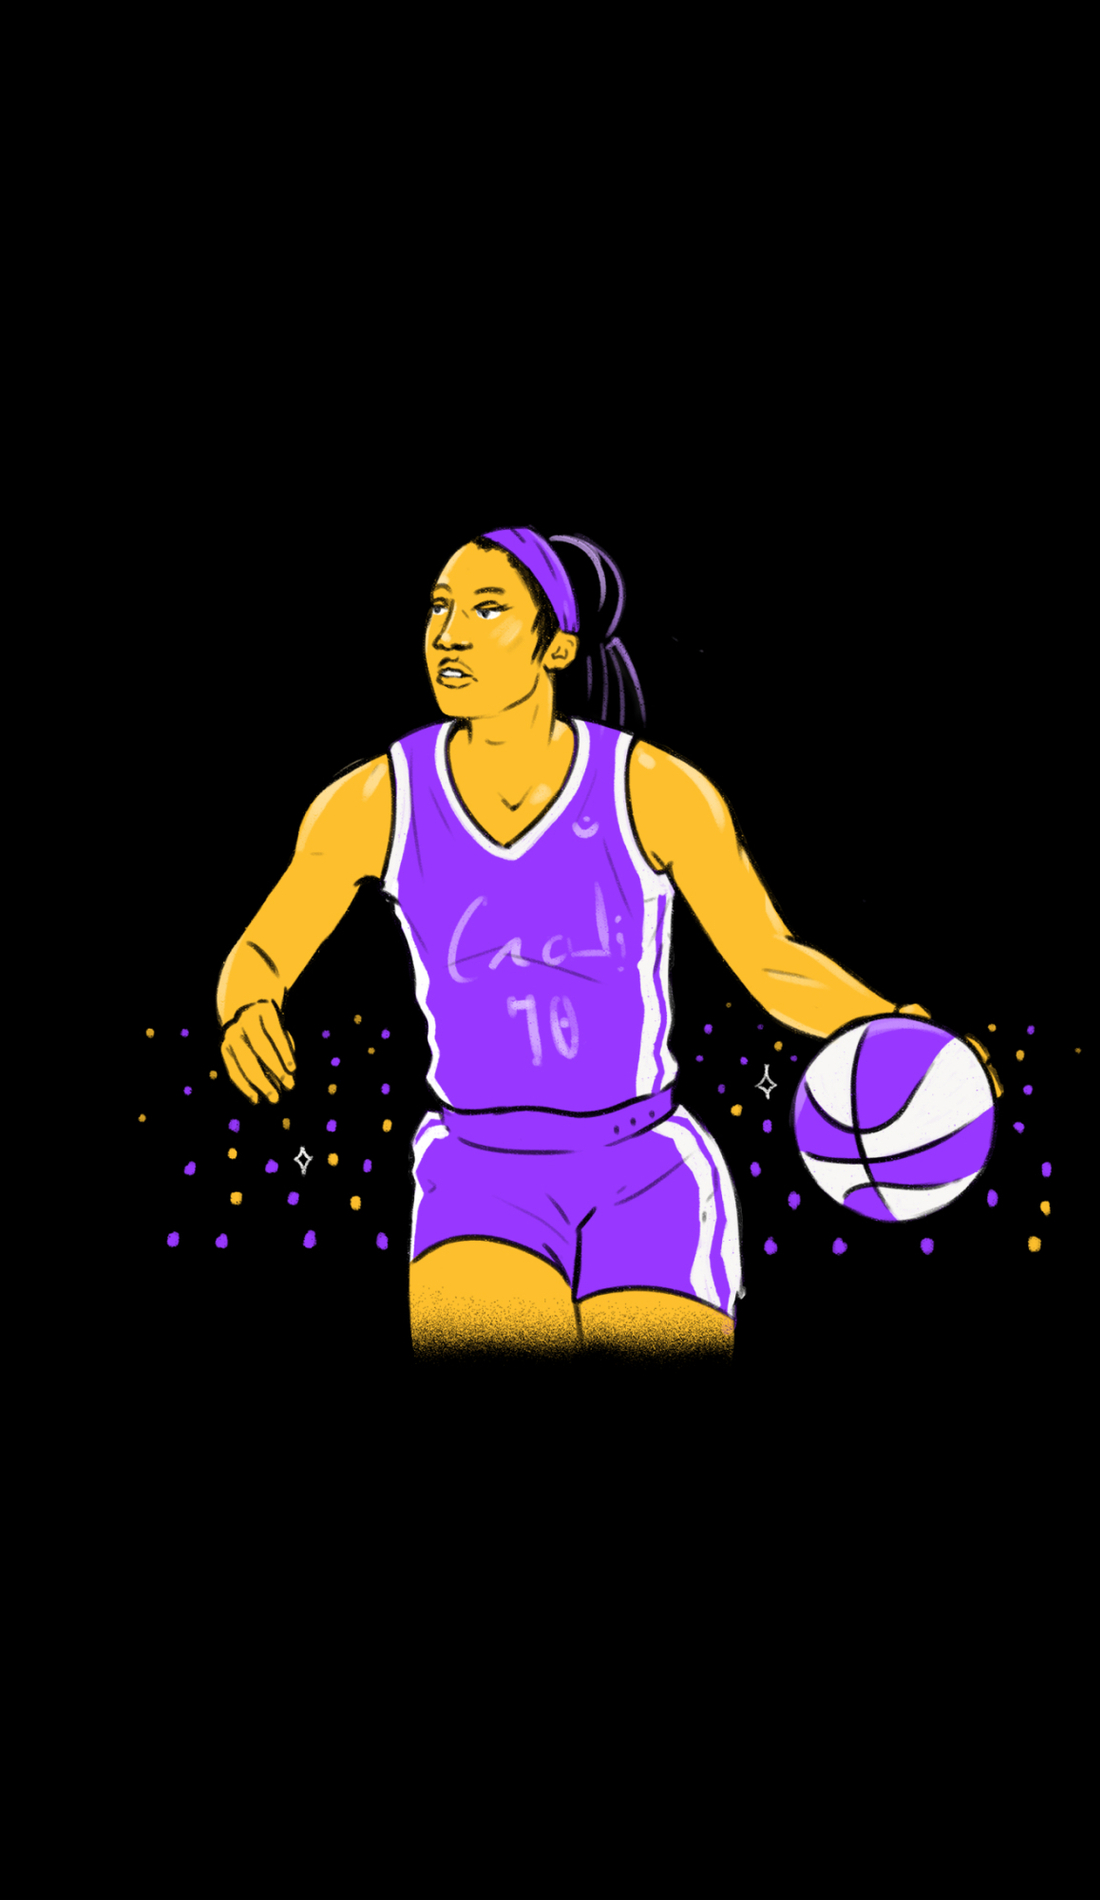 A UCLA Bruins Womens Basketball live event